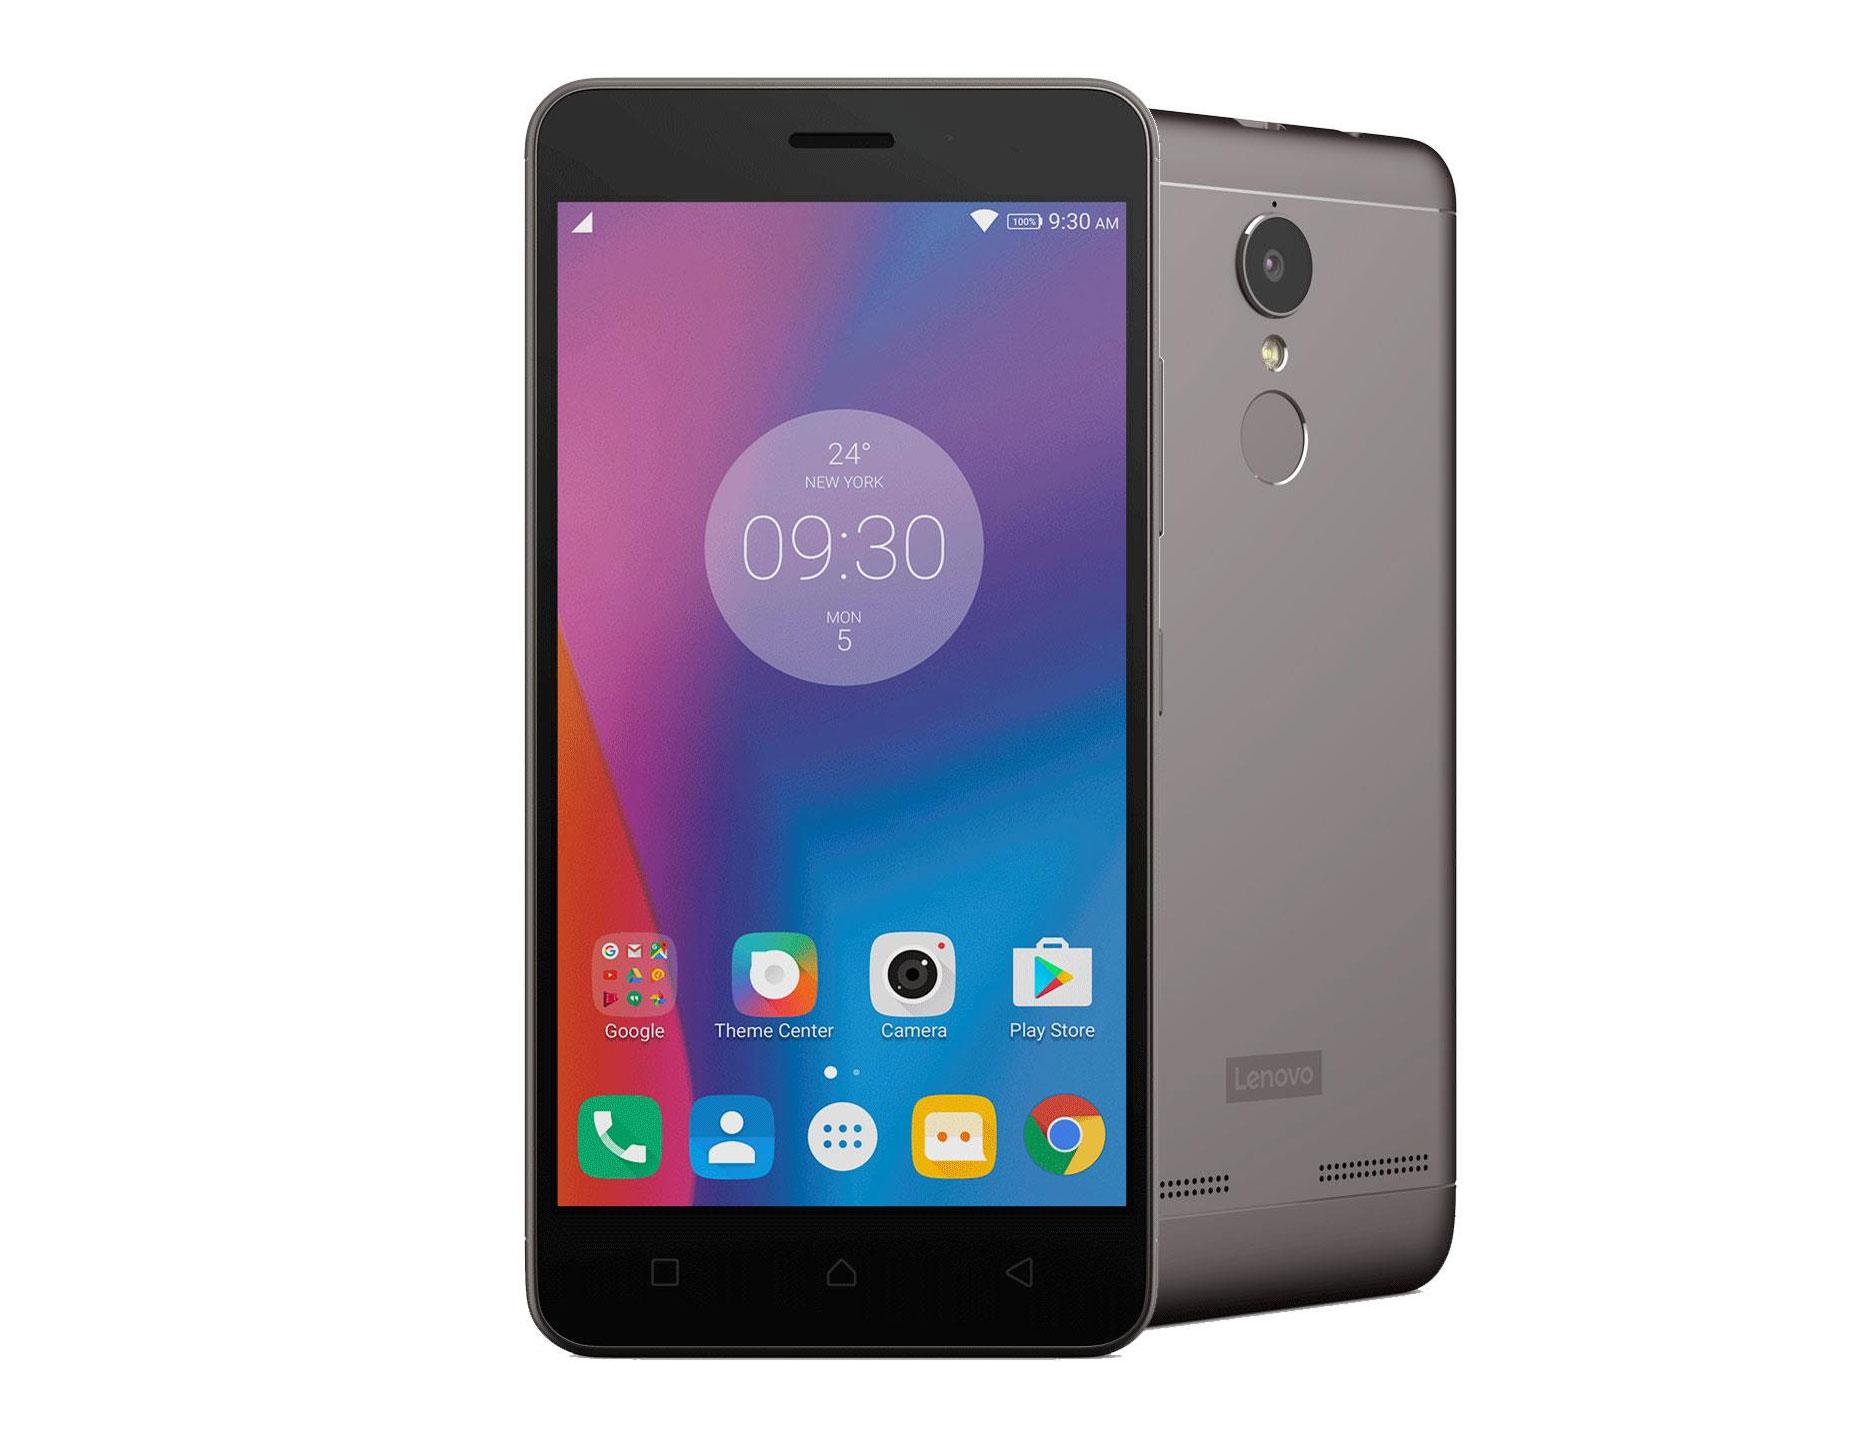 OUTLET Smartfon Lenovo K6 LTE Dual SIM Octa 16GB